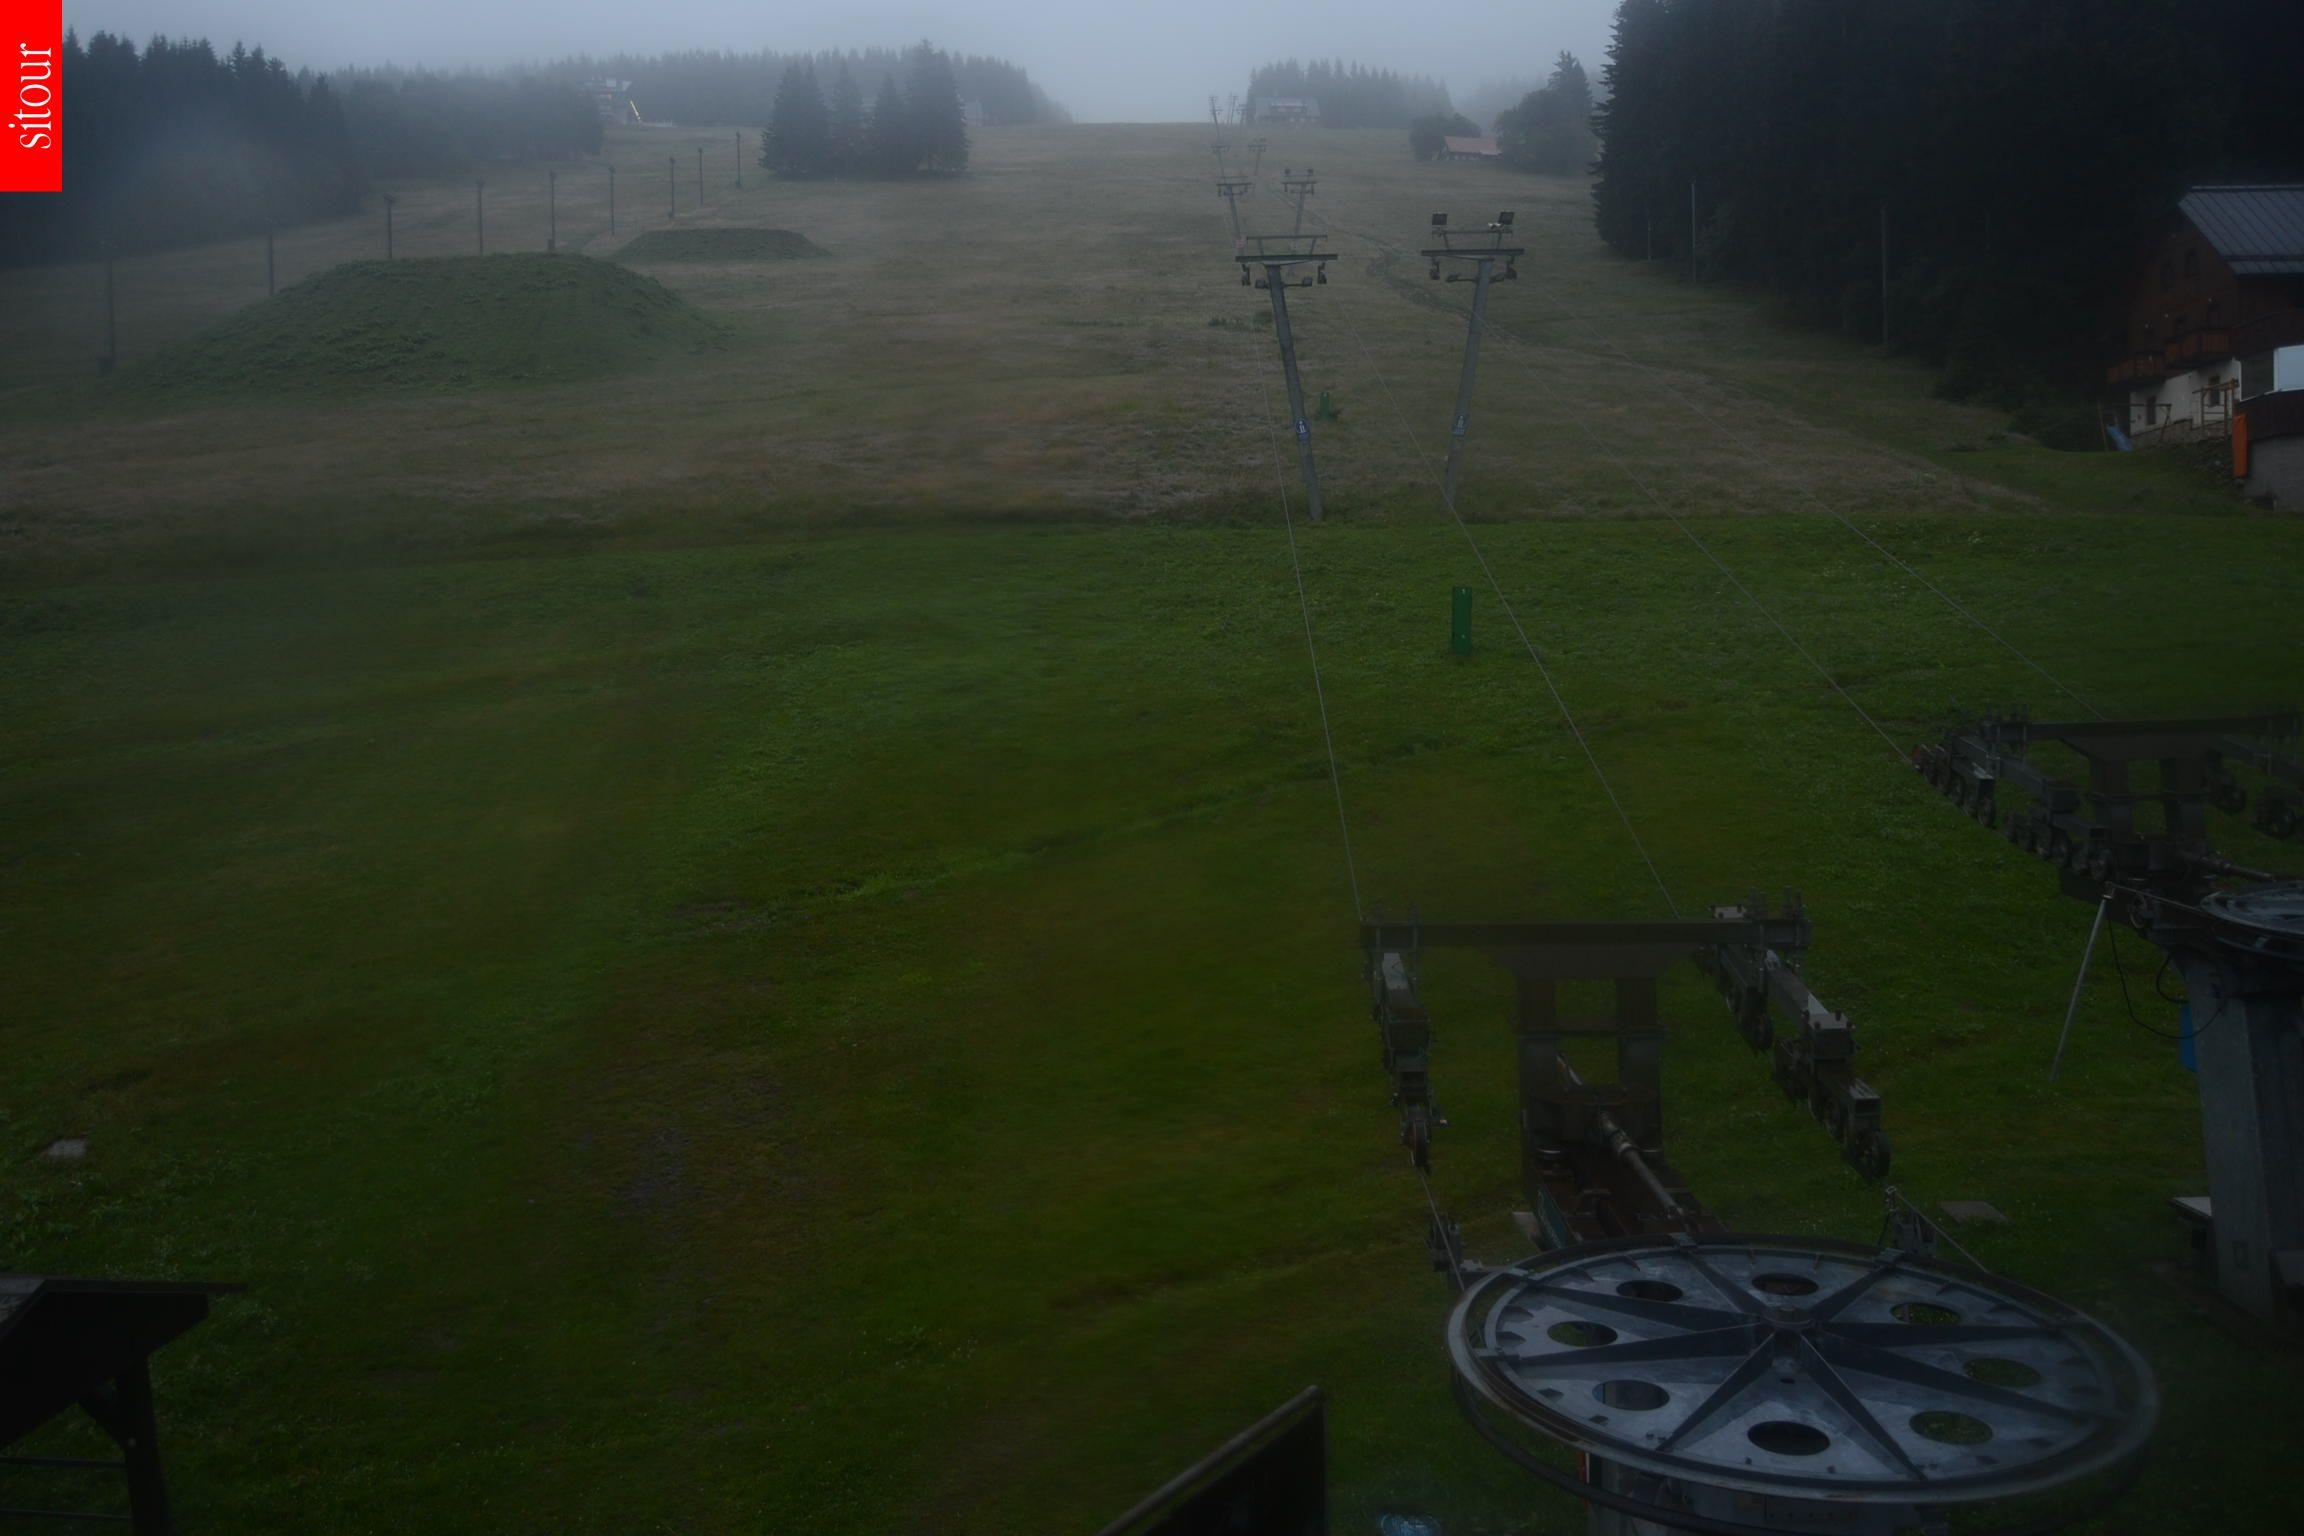 Webcam Ski Resort Pec pod Snezkou Javor - Giant Mountains